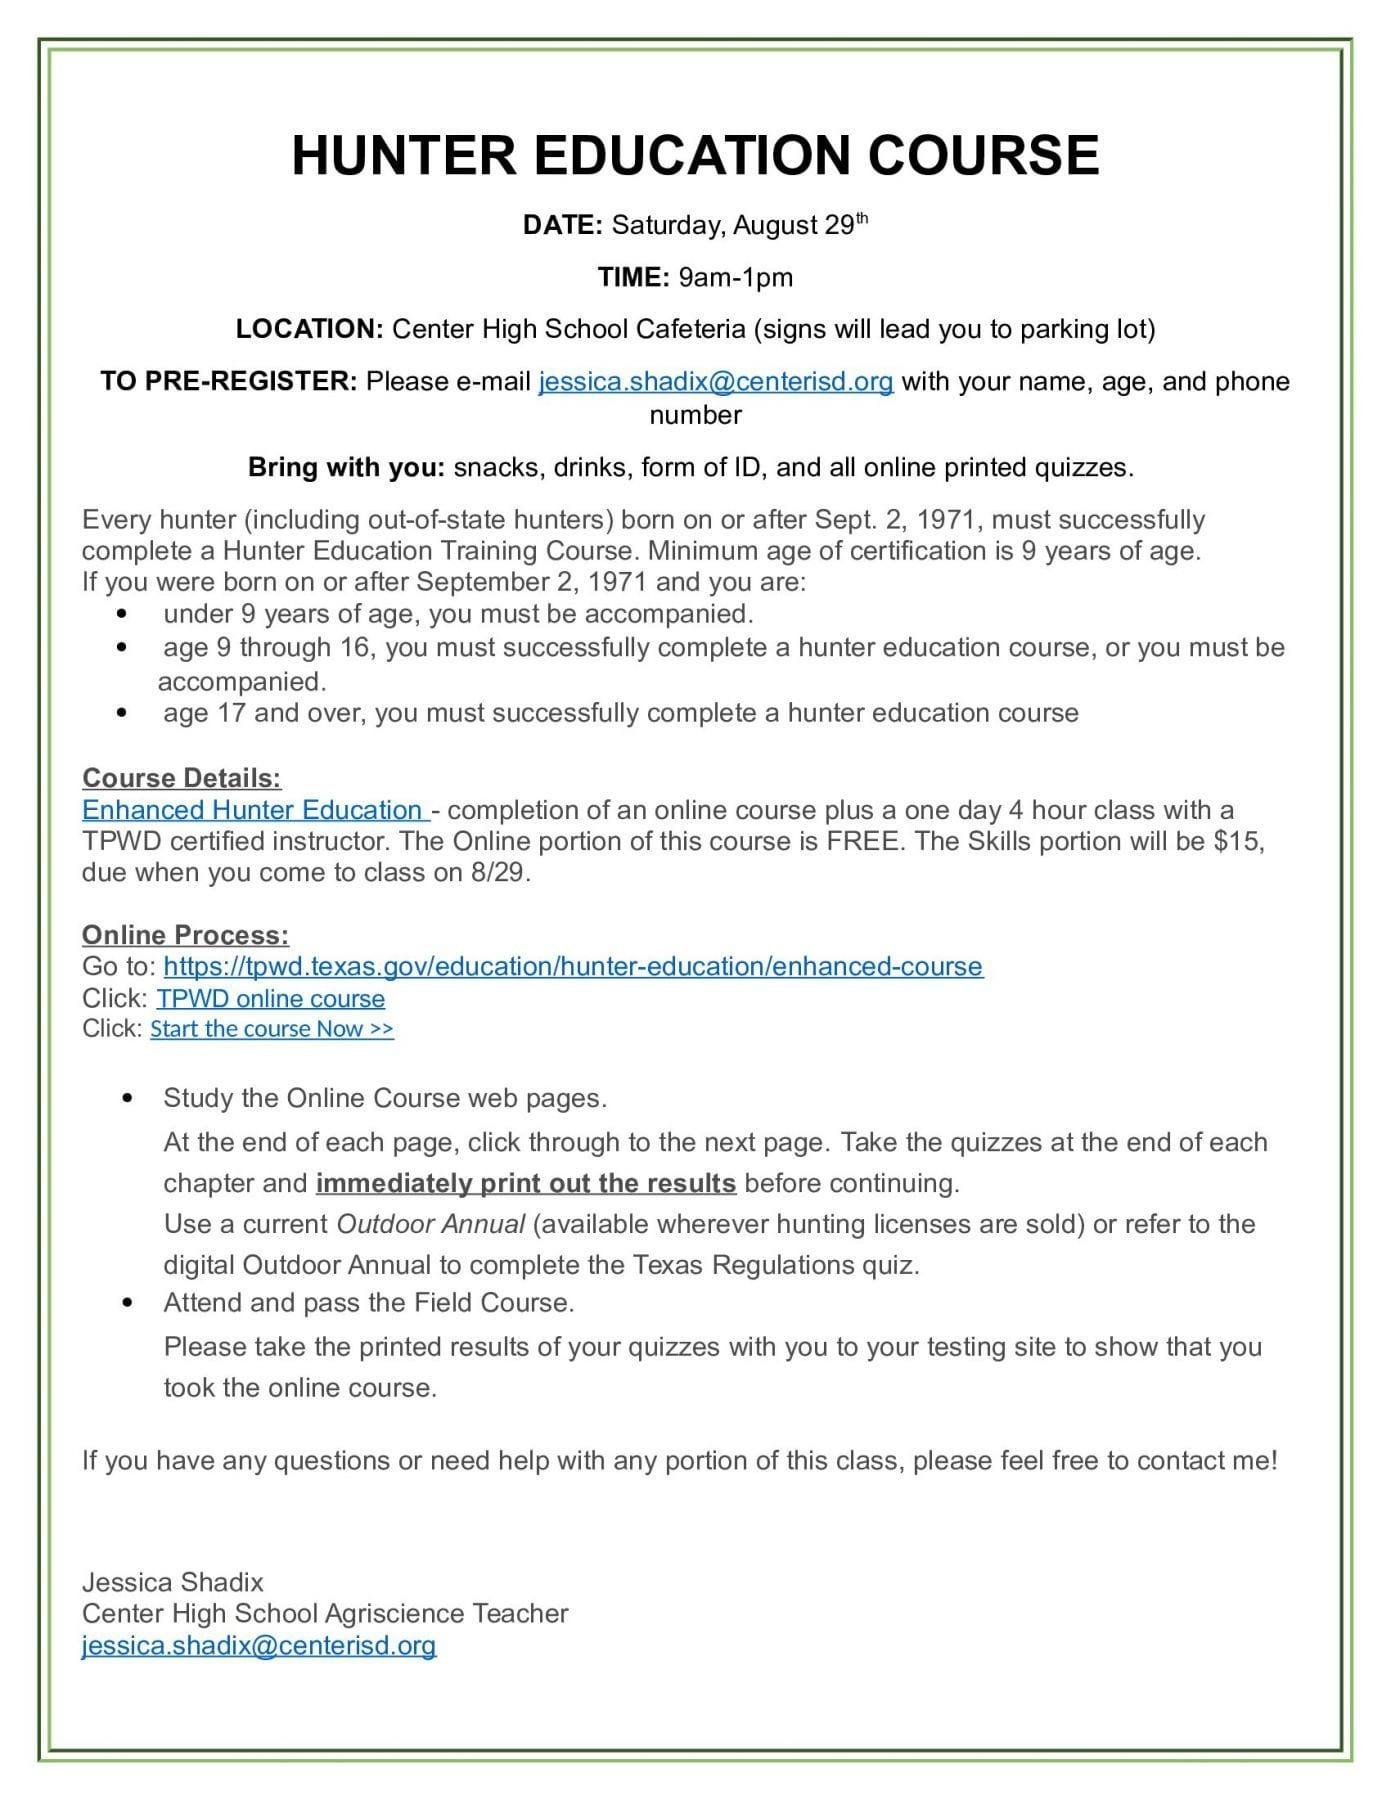 Hunter Education Homework Worksheet Answers Yooob